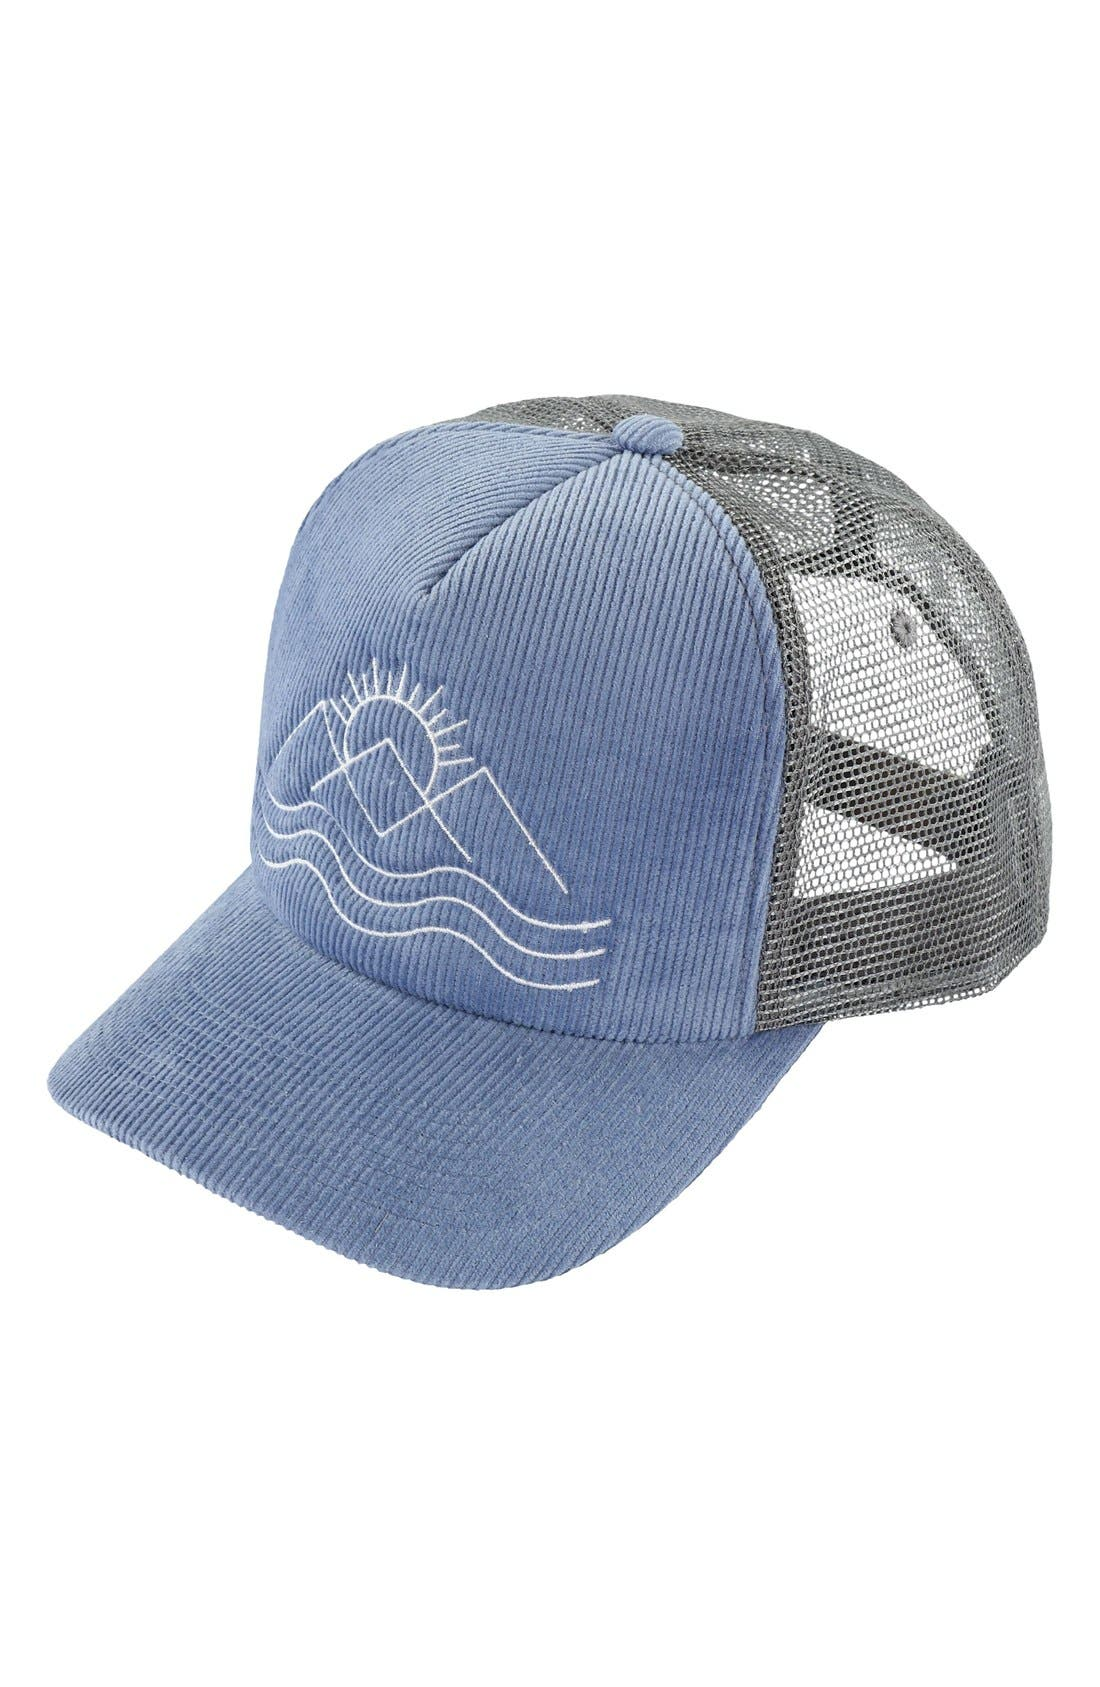 Alternate Image 1 Selected - O'Neill Outlook Corduroy Trucker Hat